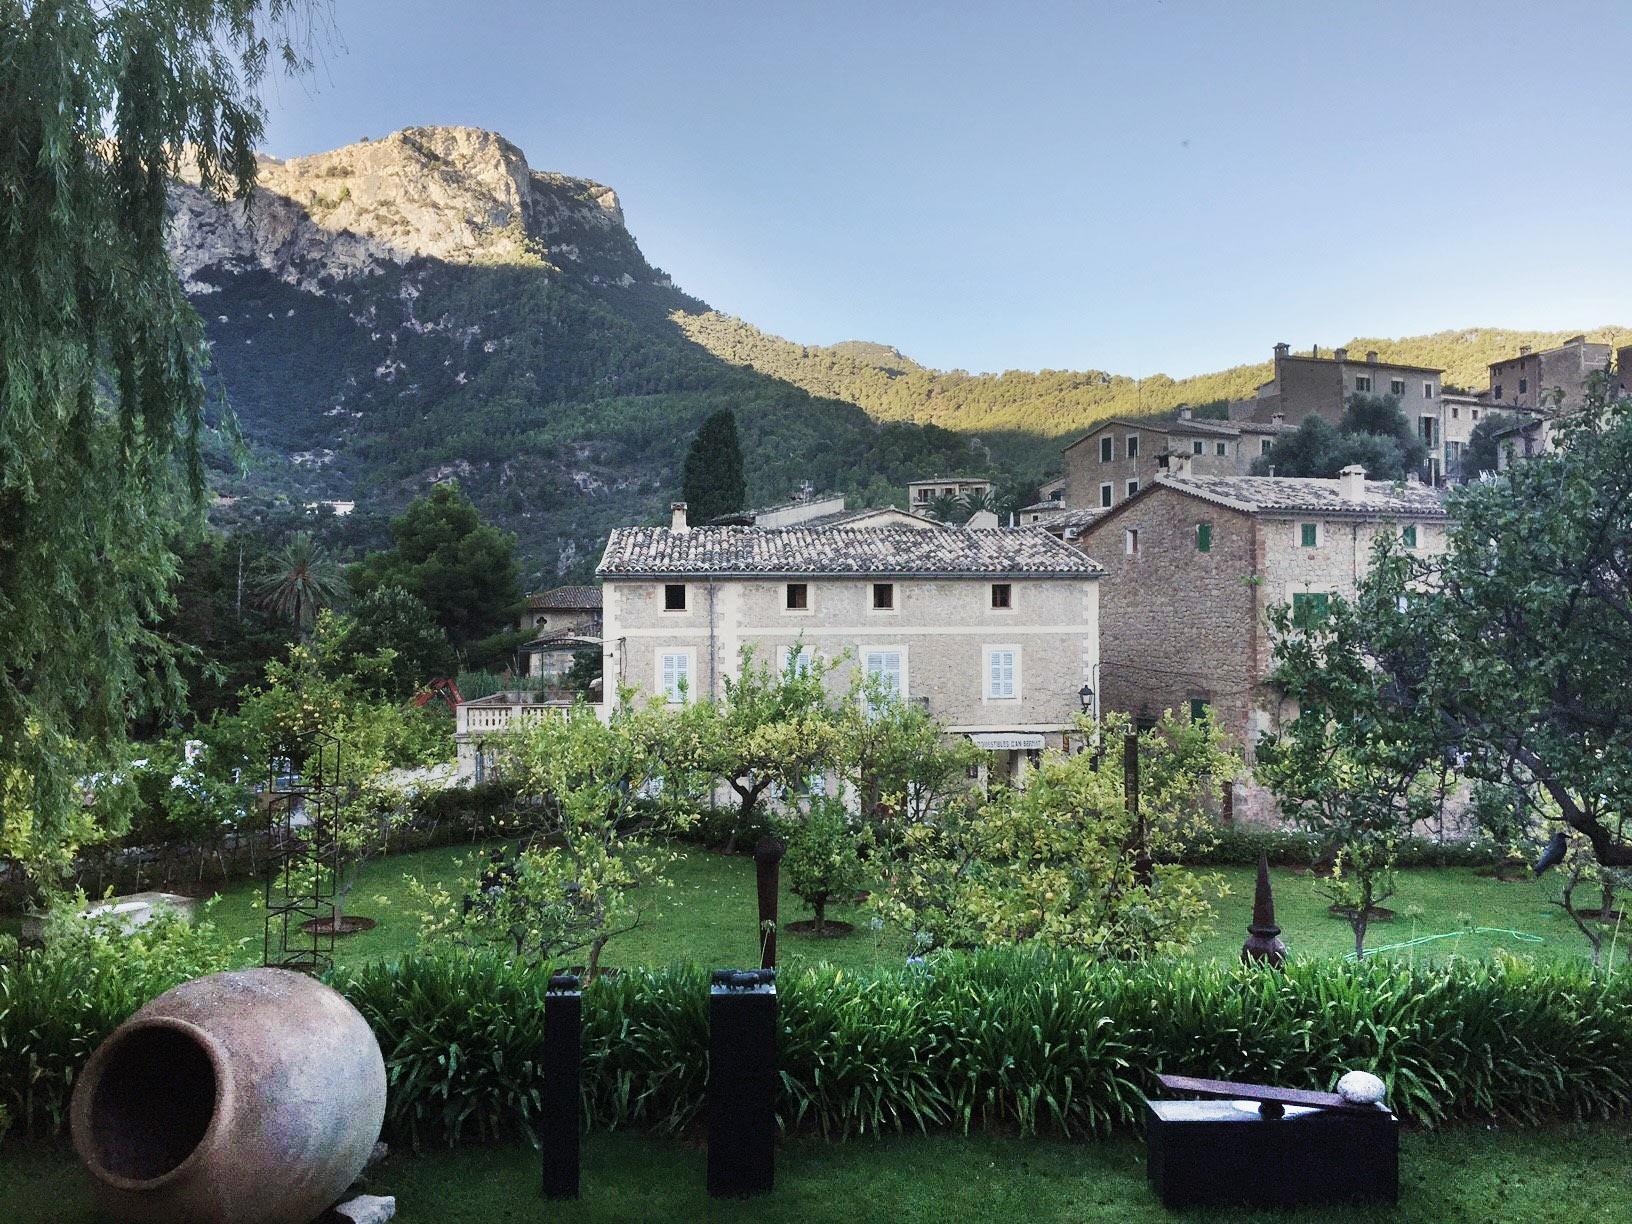 Rocky mountain terrain flanks the lush olive groves at Deia